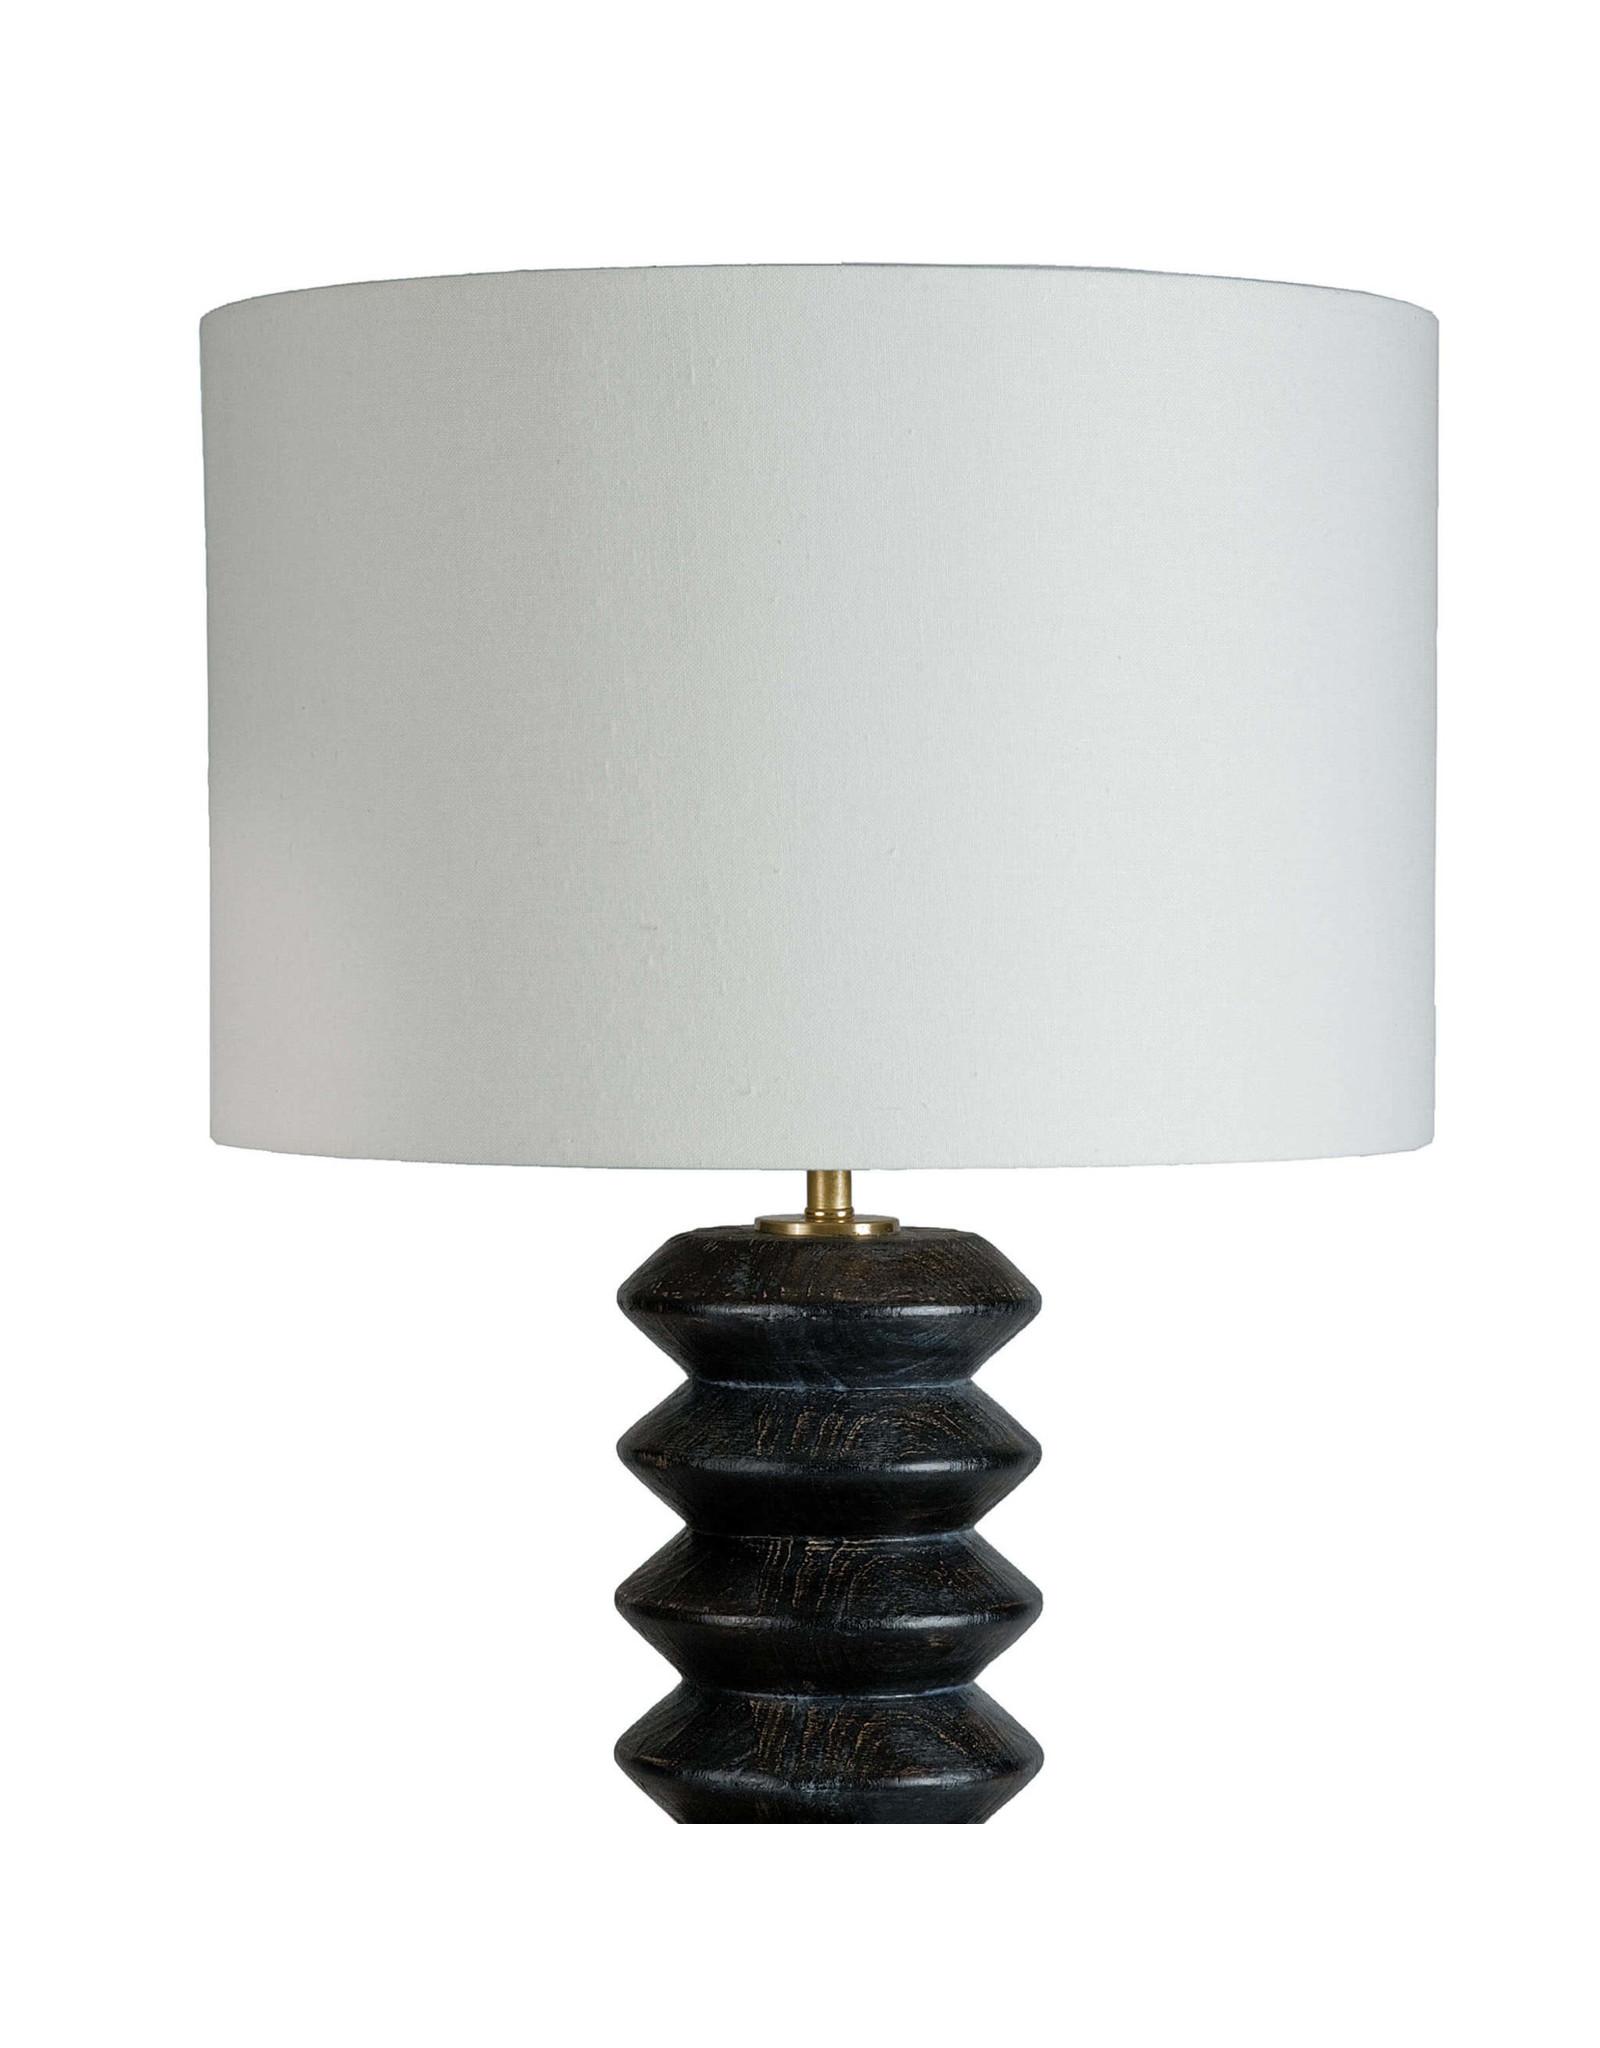 Accordion Table Lamp (Ebony)